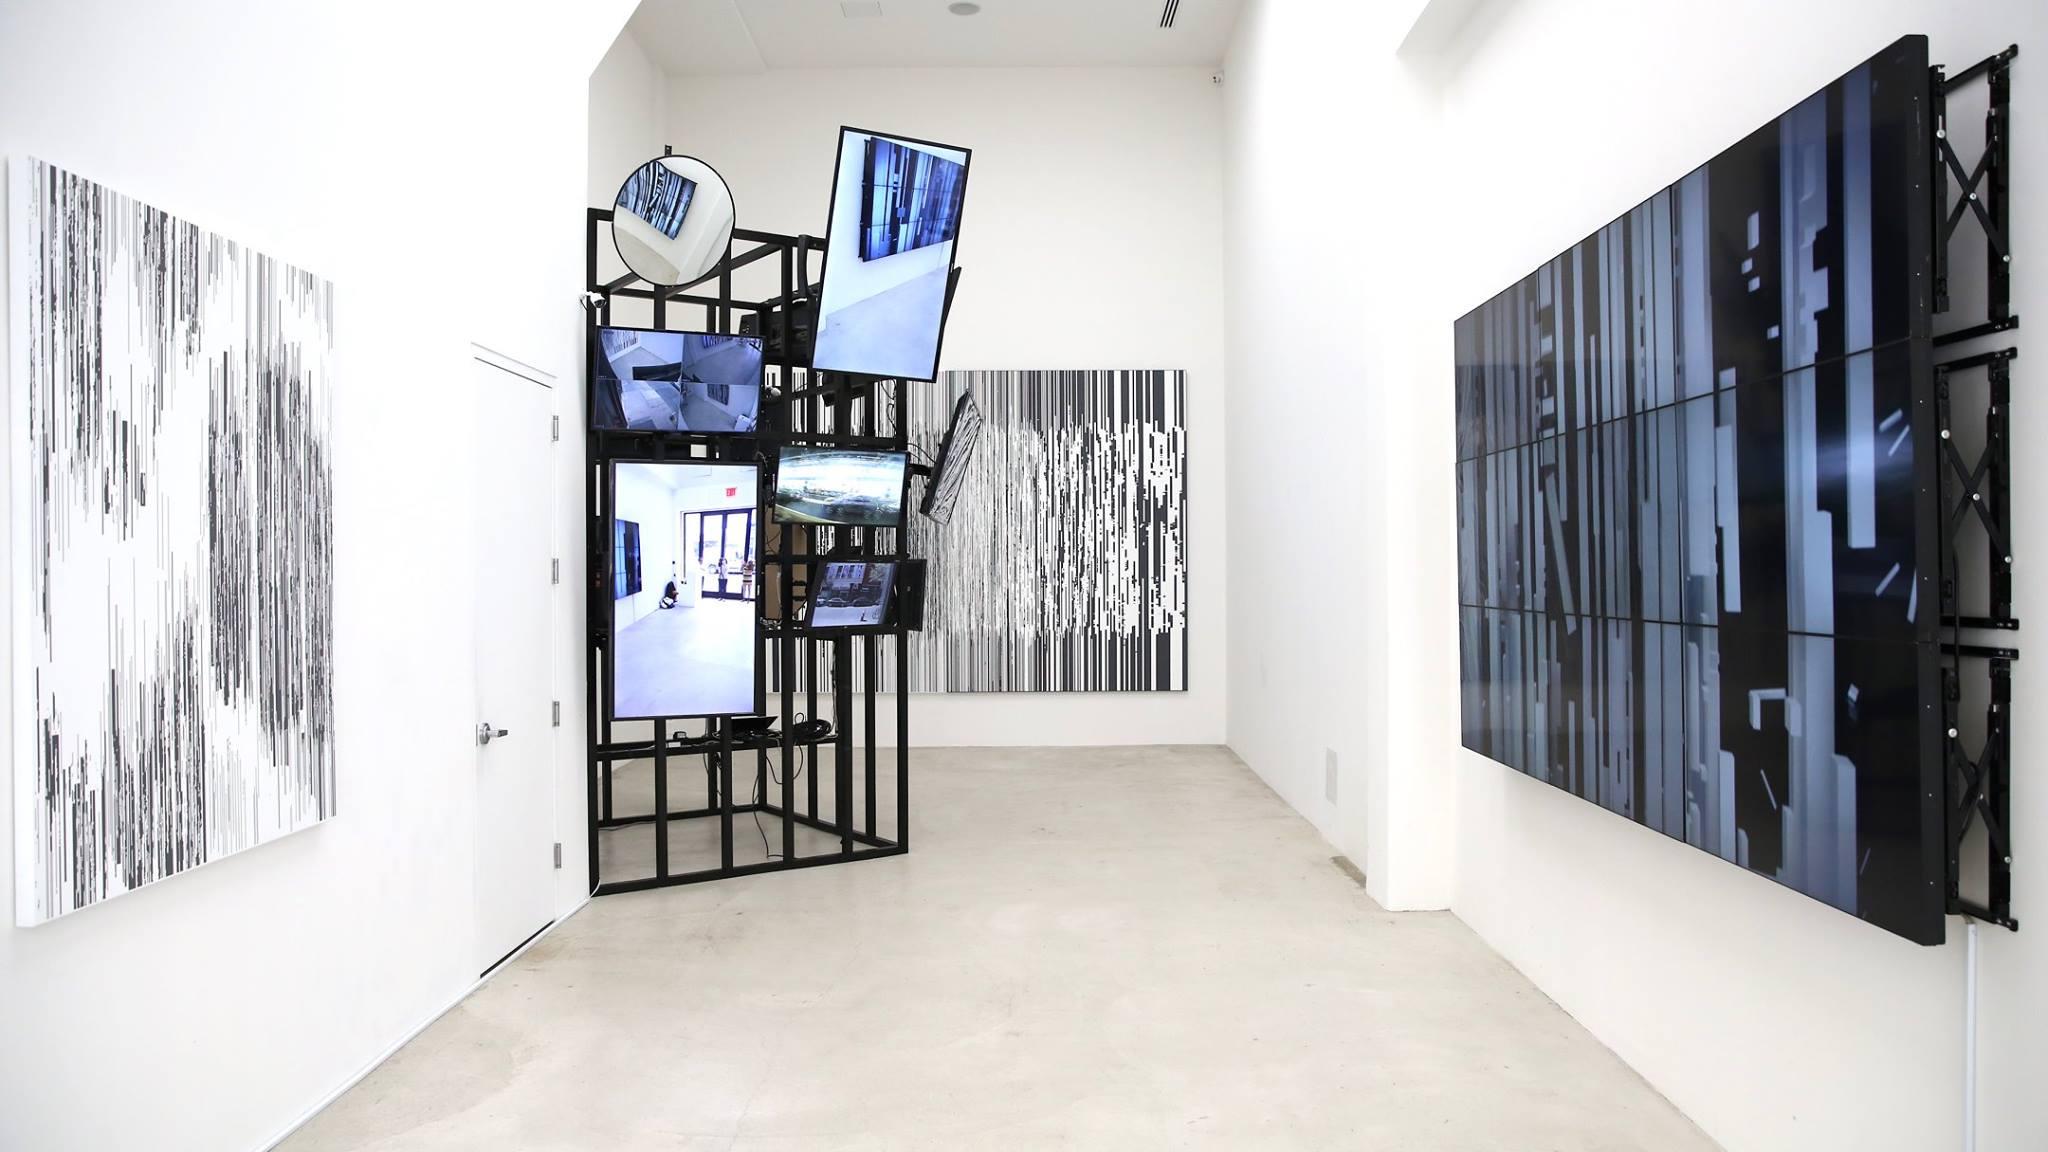 J Park Trajectory At Shin Gallery New York